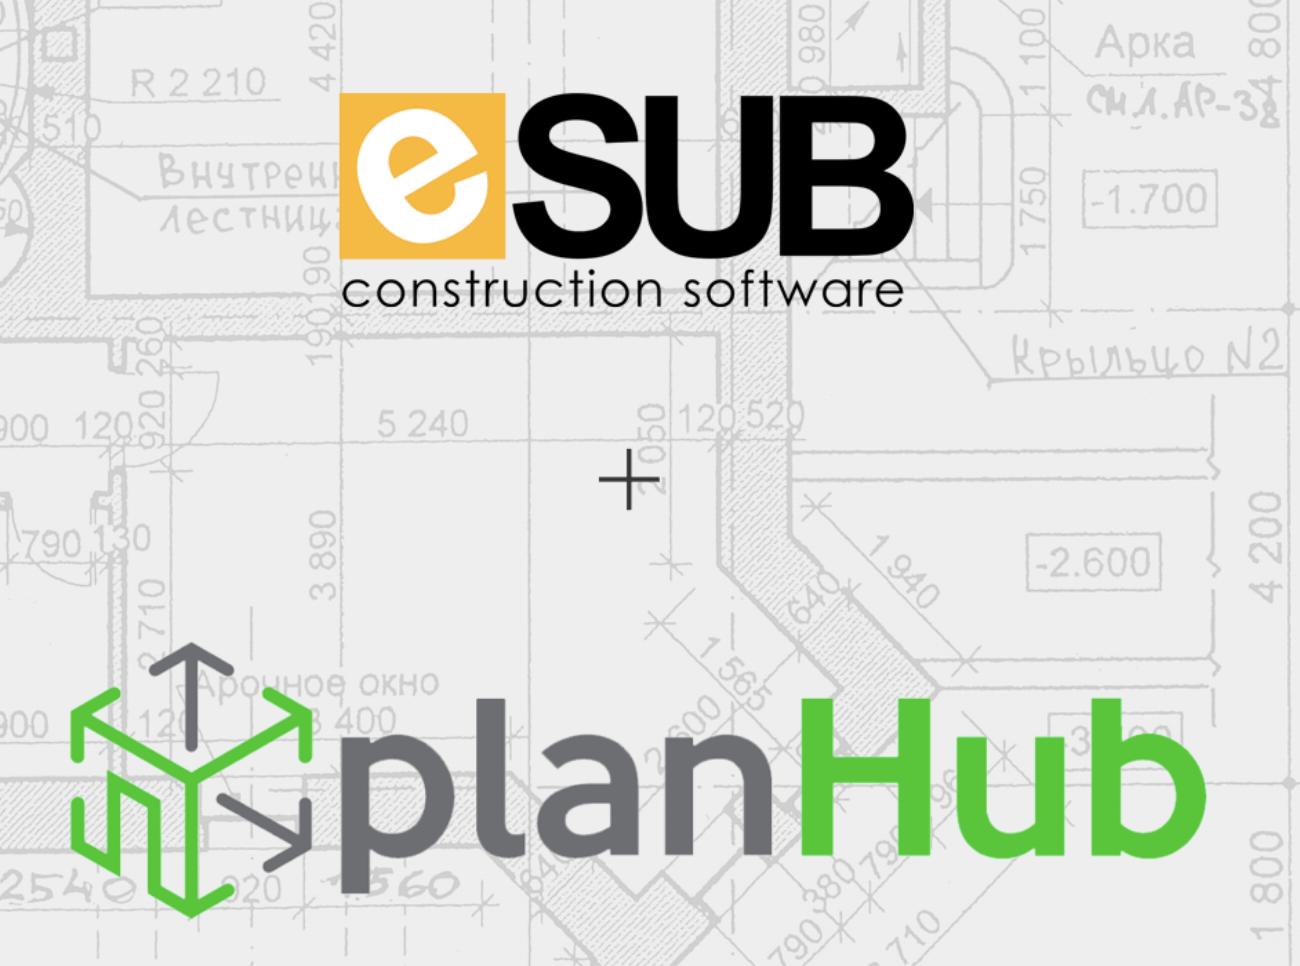 PlanHub and eSUB Construction Software Partnership Announcement